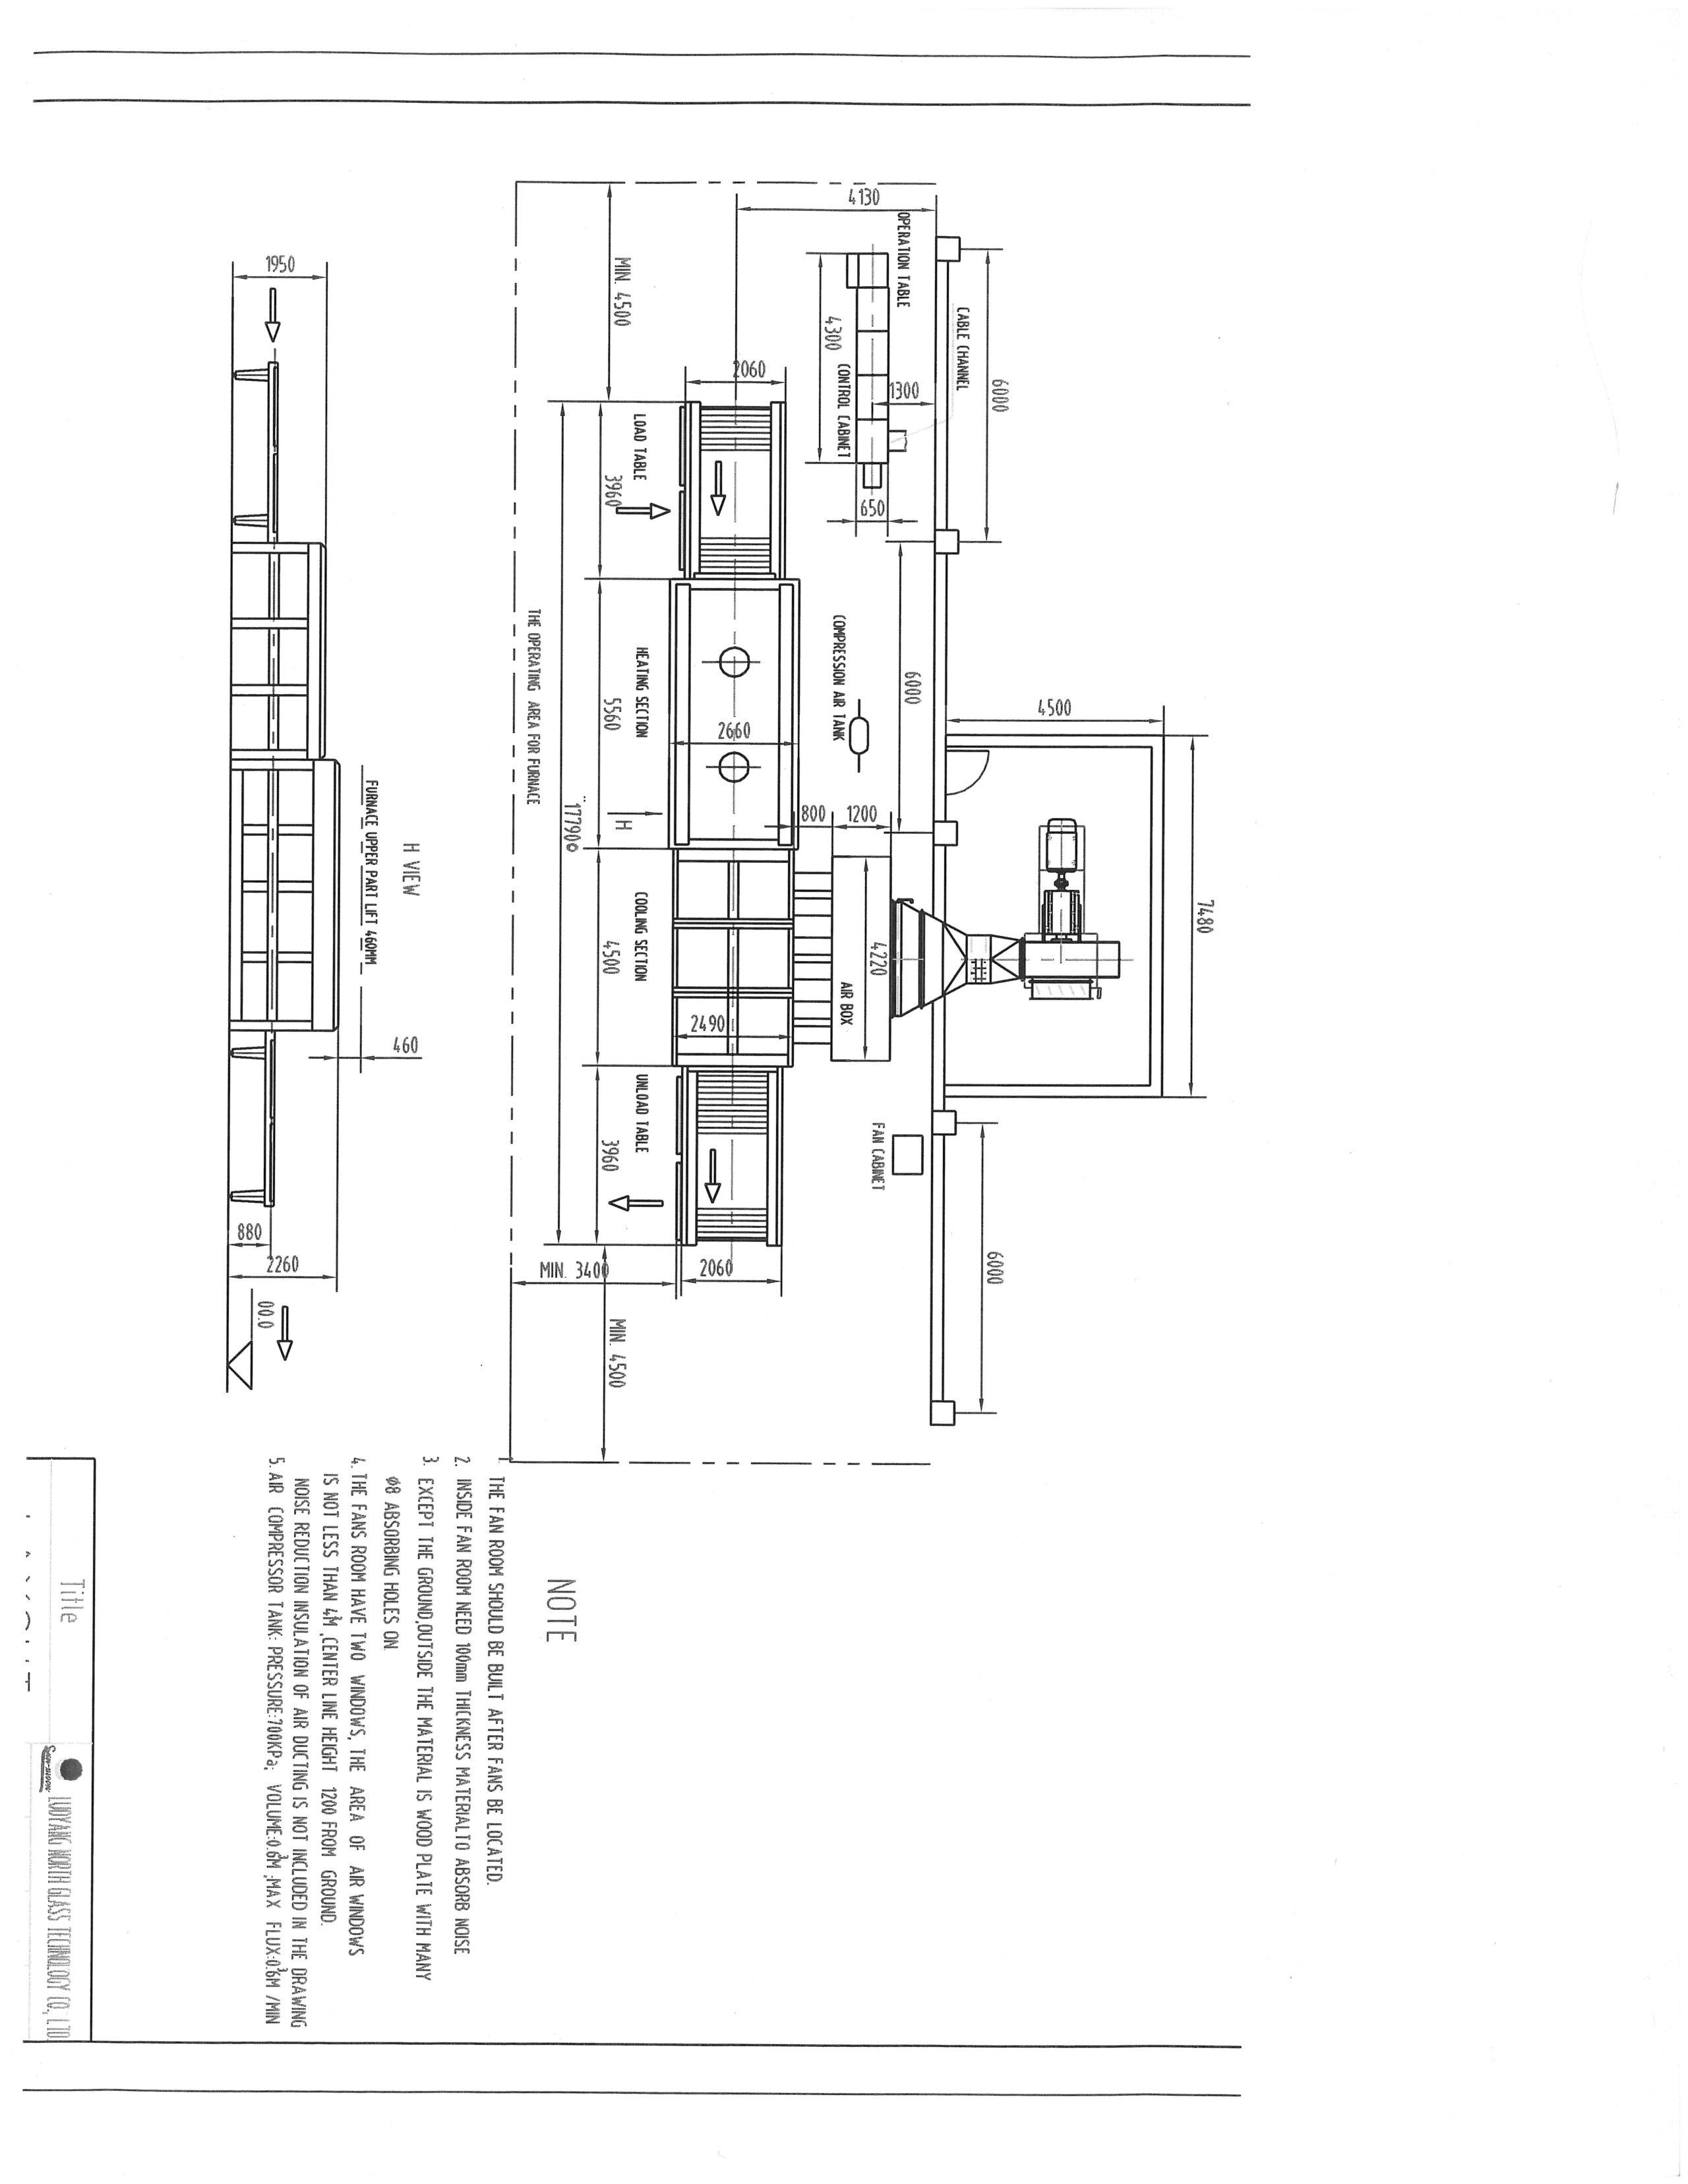 Northglass Furnace Sng 1g36